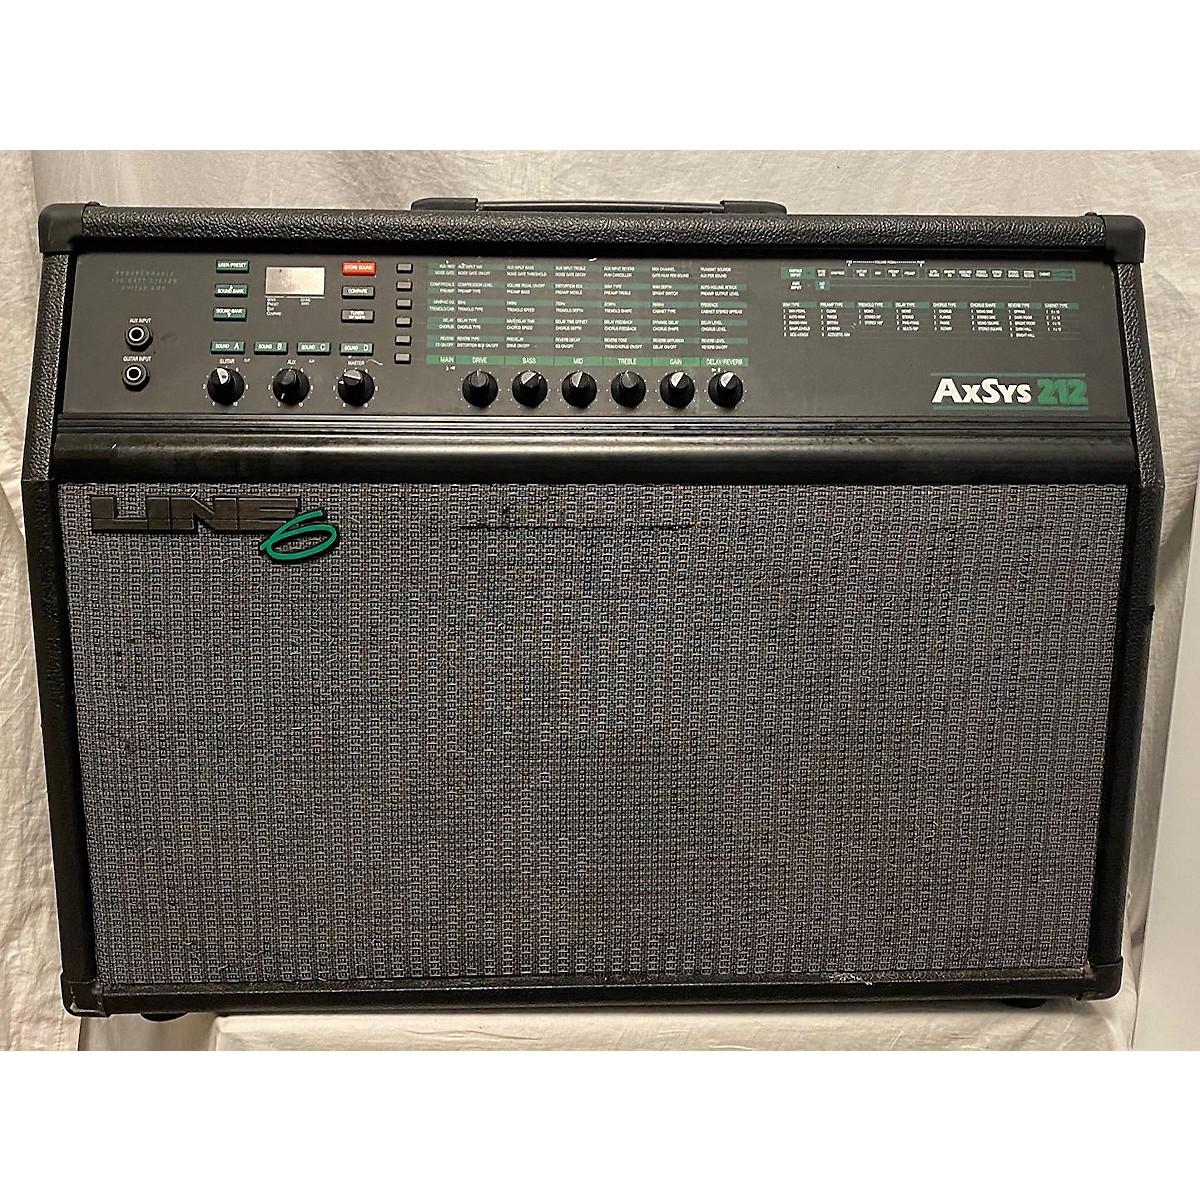 Line 6 AxSys 212 Guitar Combo Amp